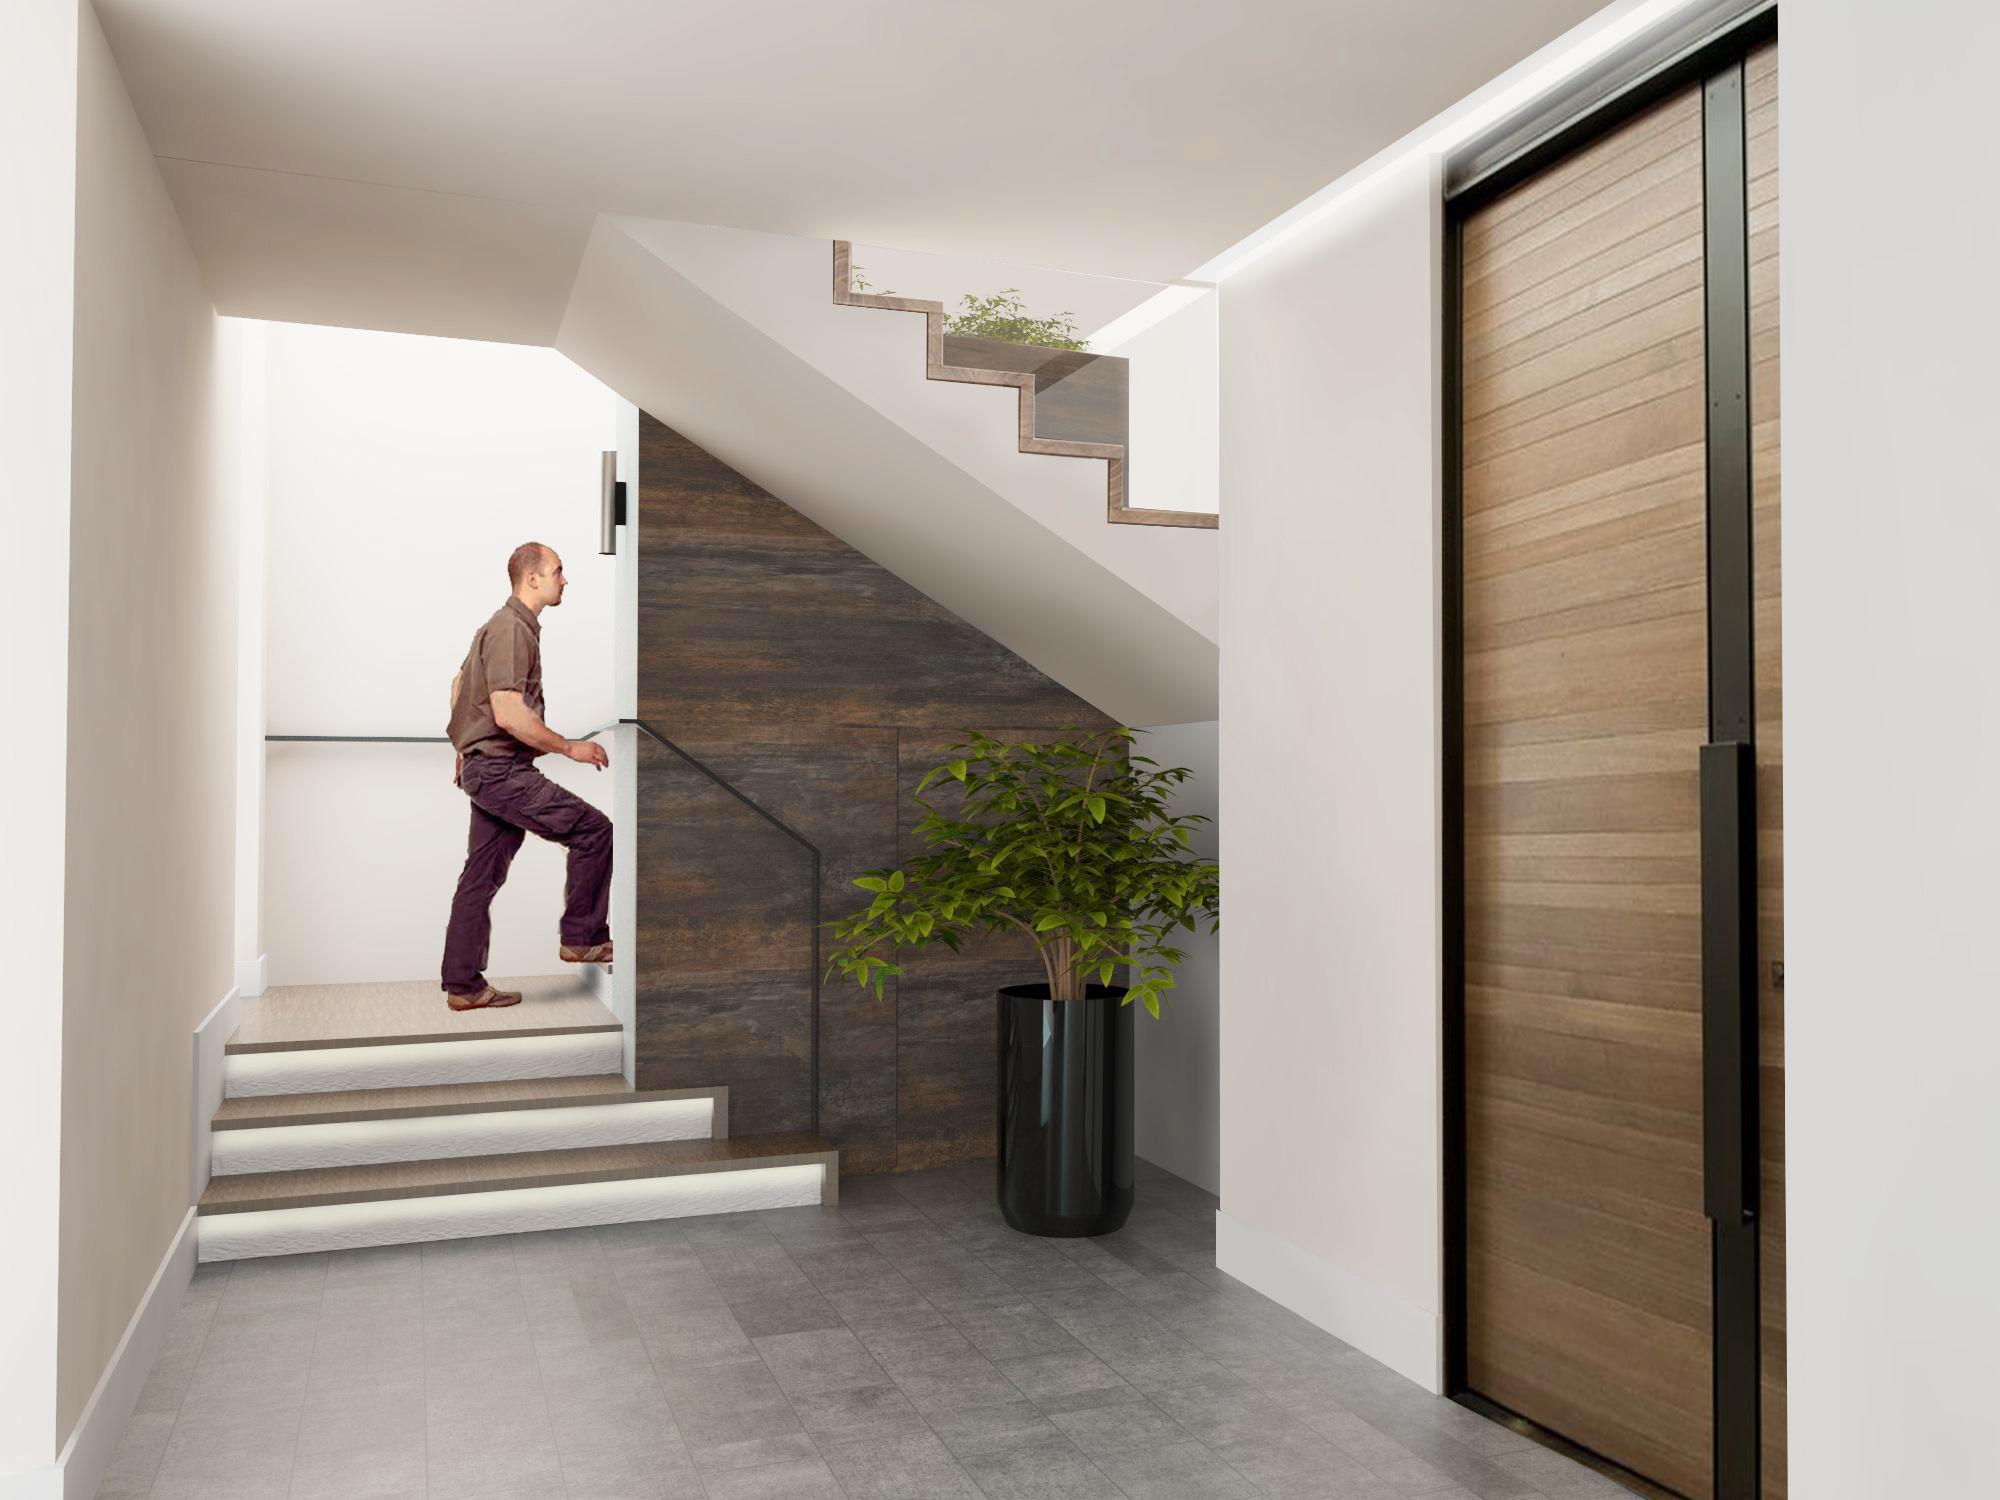 Apartment building lobby nemanjatopic - How to design an apartment ...